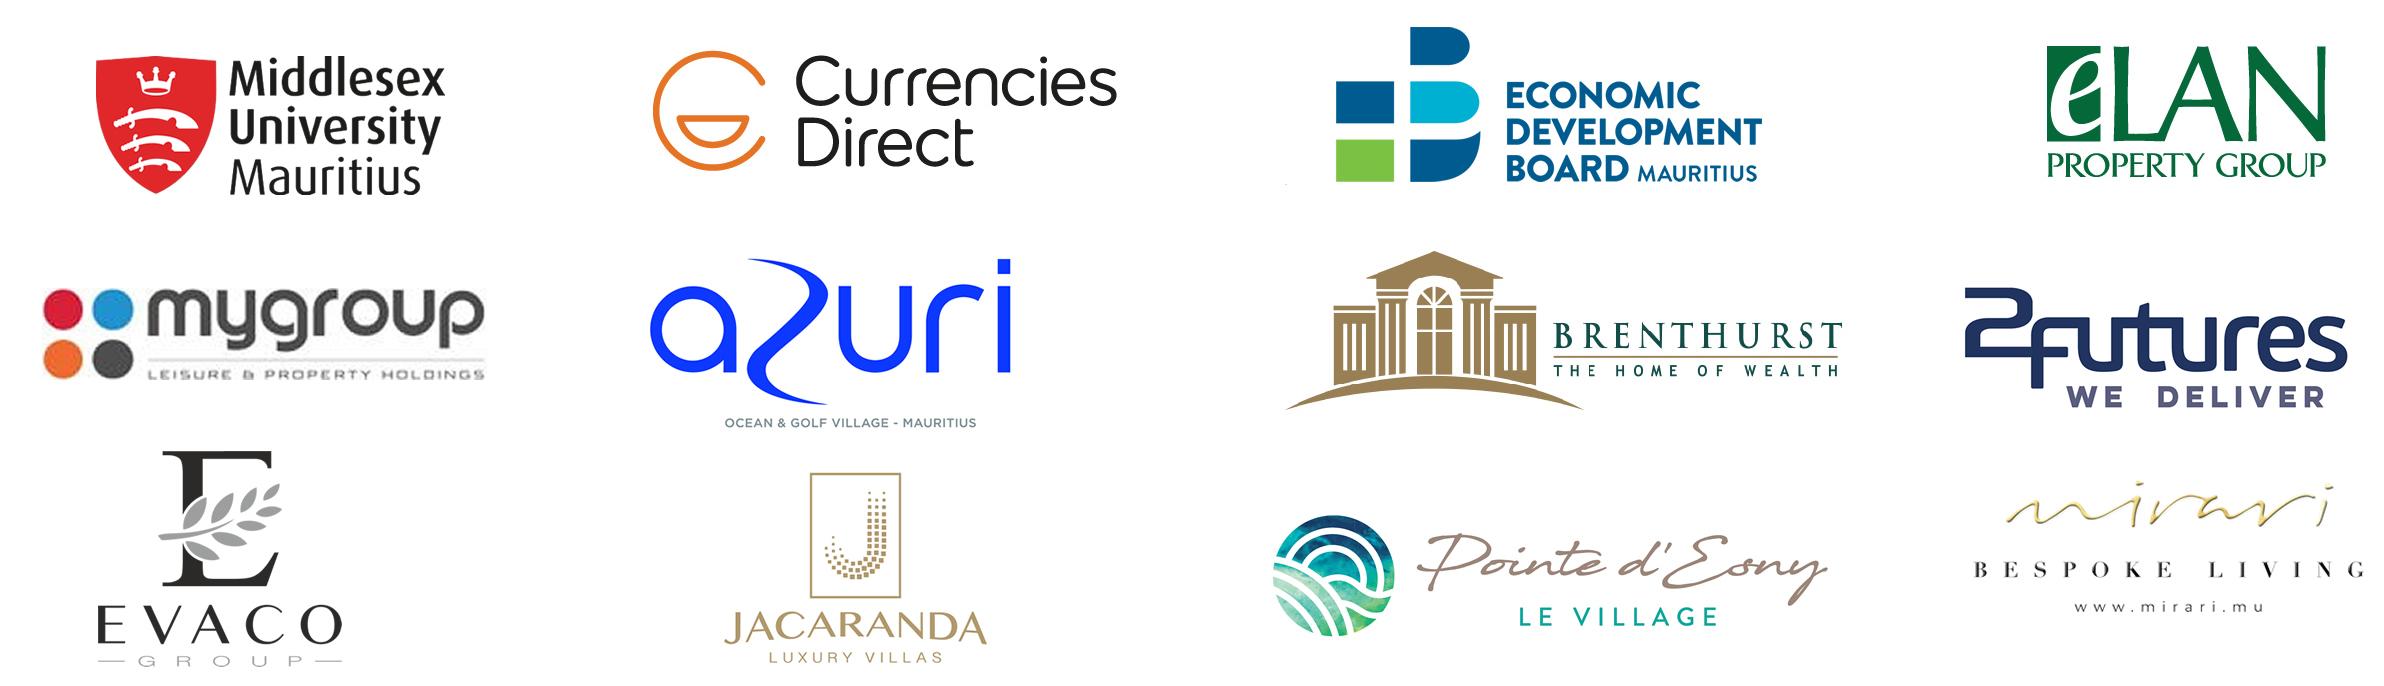 invest-in-mauritius-partners-logos-big